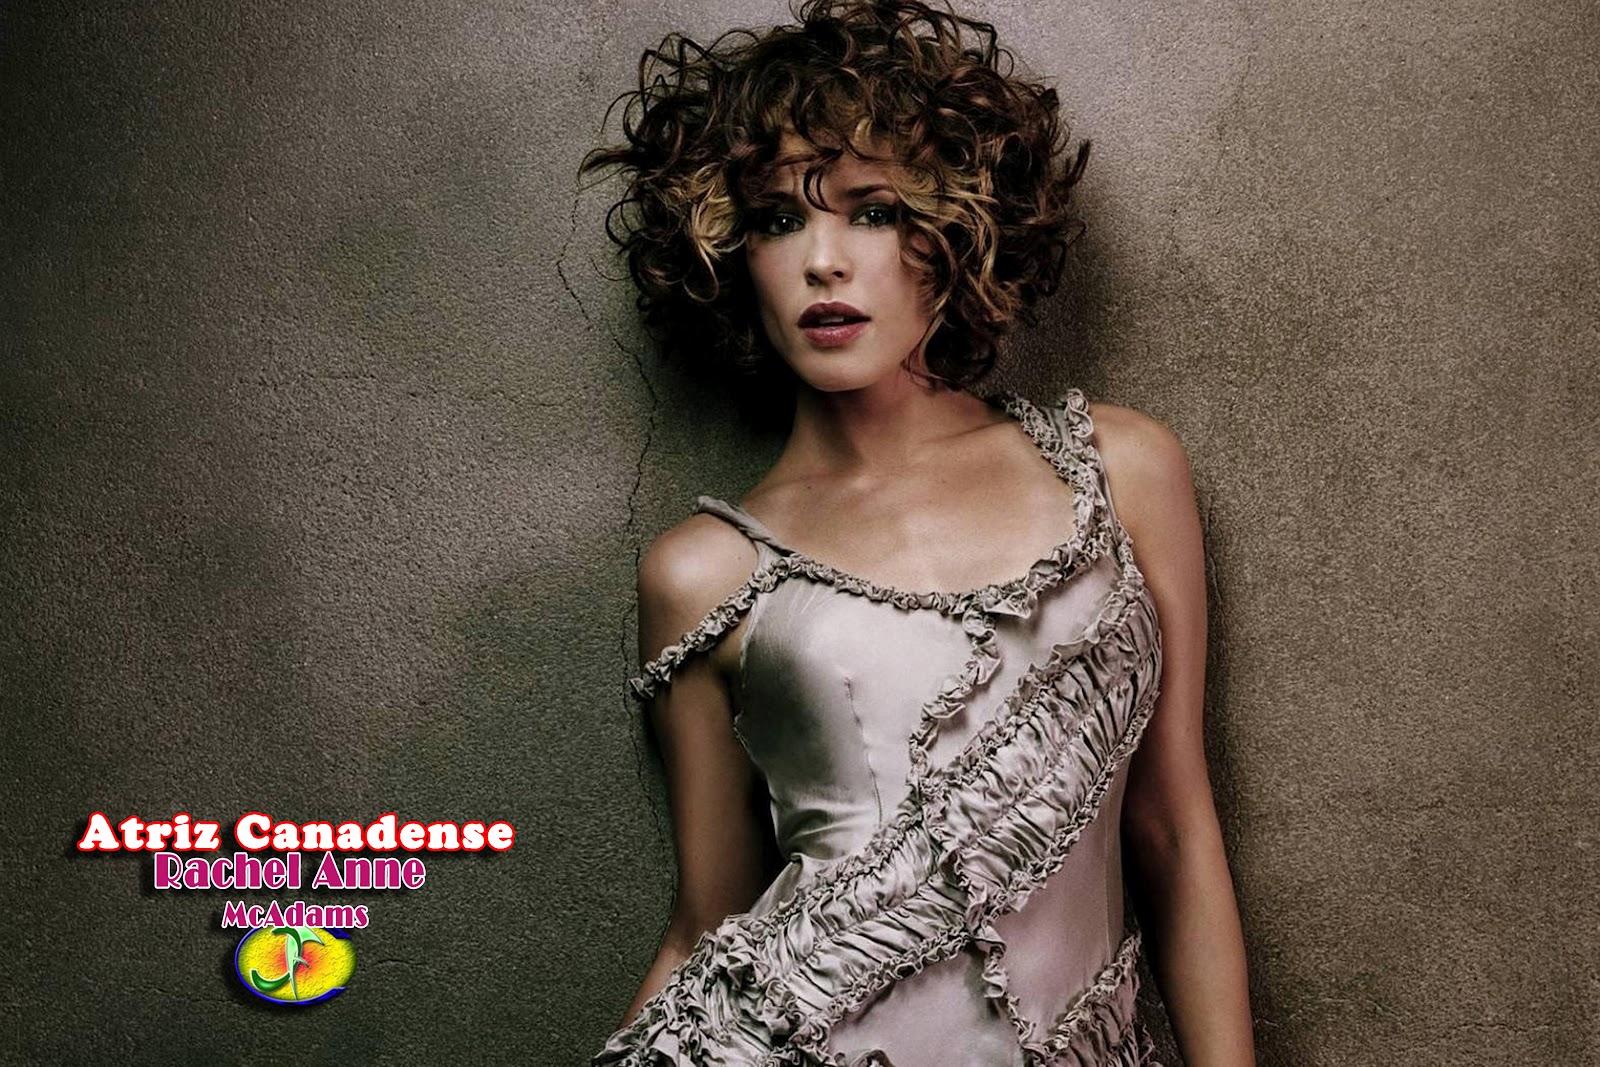 http://4.bp.blogspot.com/-fR9YKgNOODs/T-fv_zyo0nI/AAAAAAAAEK4/ws3NDhKNenA/s1600/FAT+-+Rachel+Anne+McAdams+-+Canad%C3%A1-London+-+781117+-+33+anos+-+05.jpg